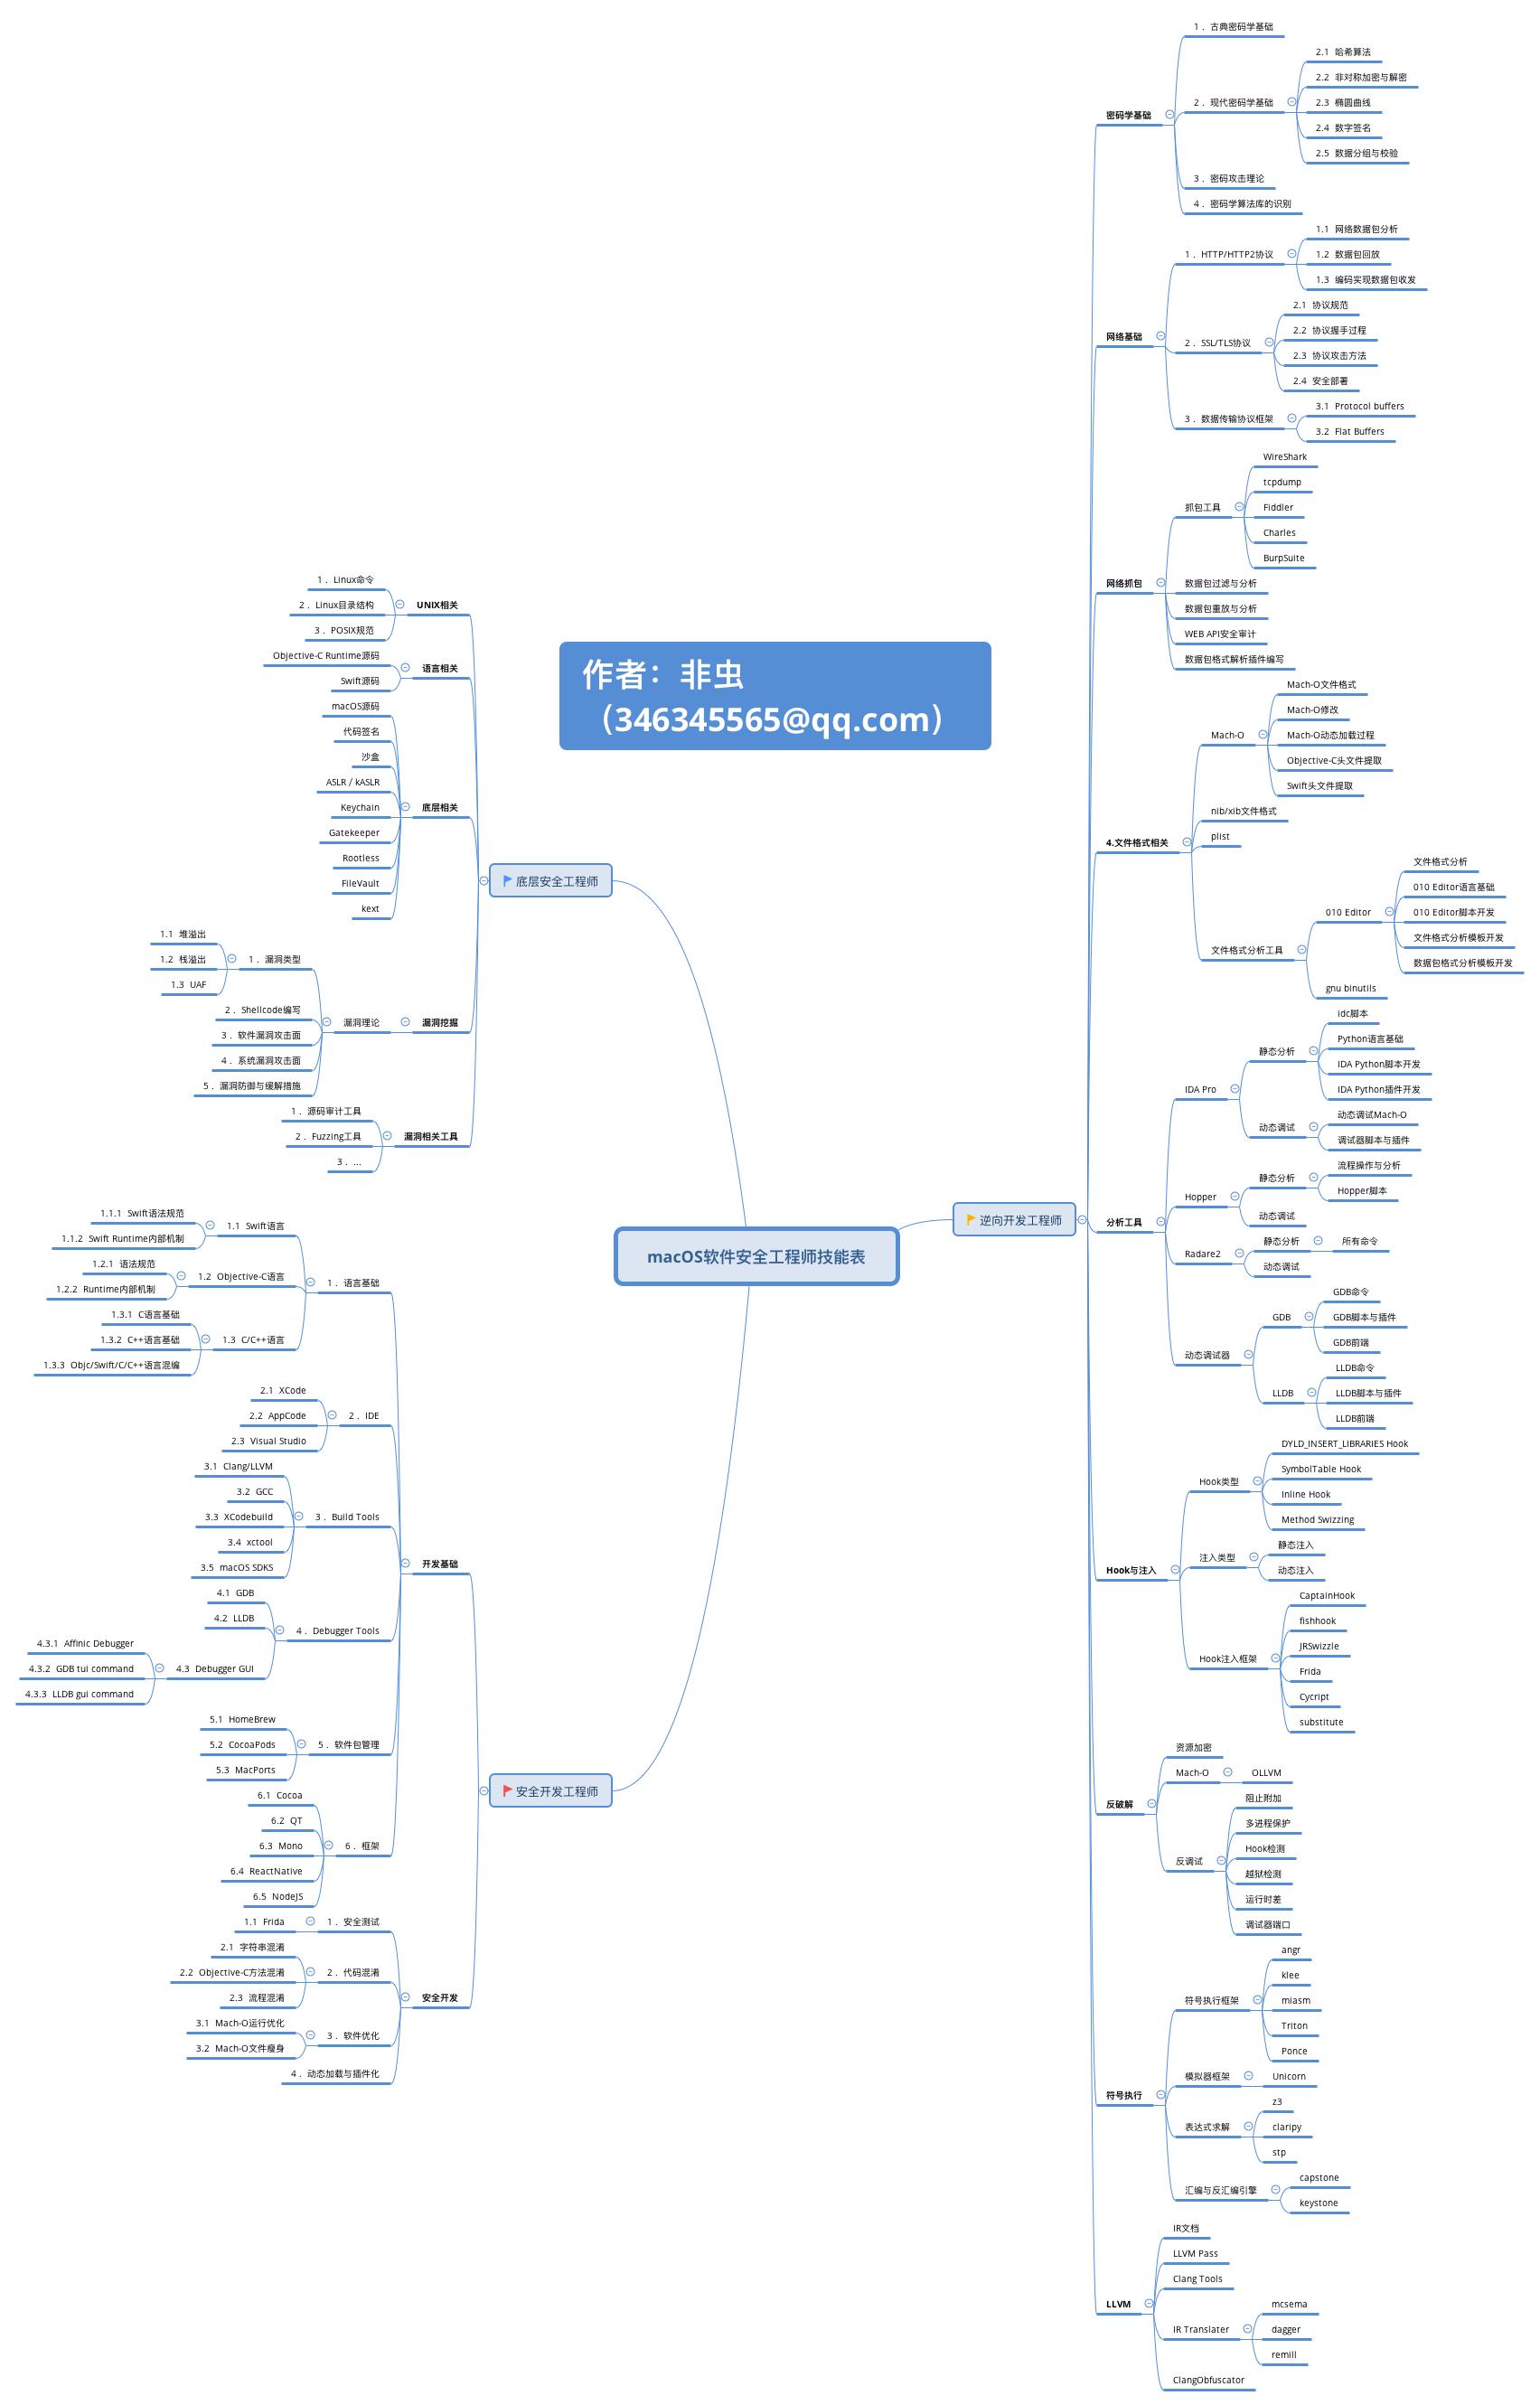 macOS软件安全工程师技能表